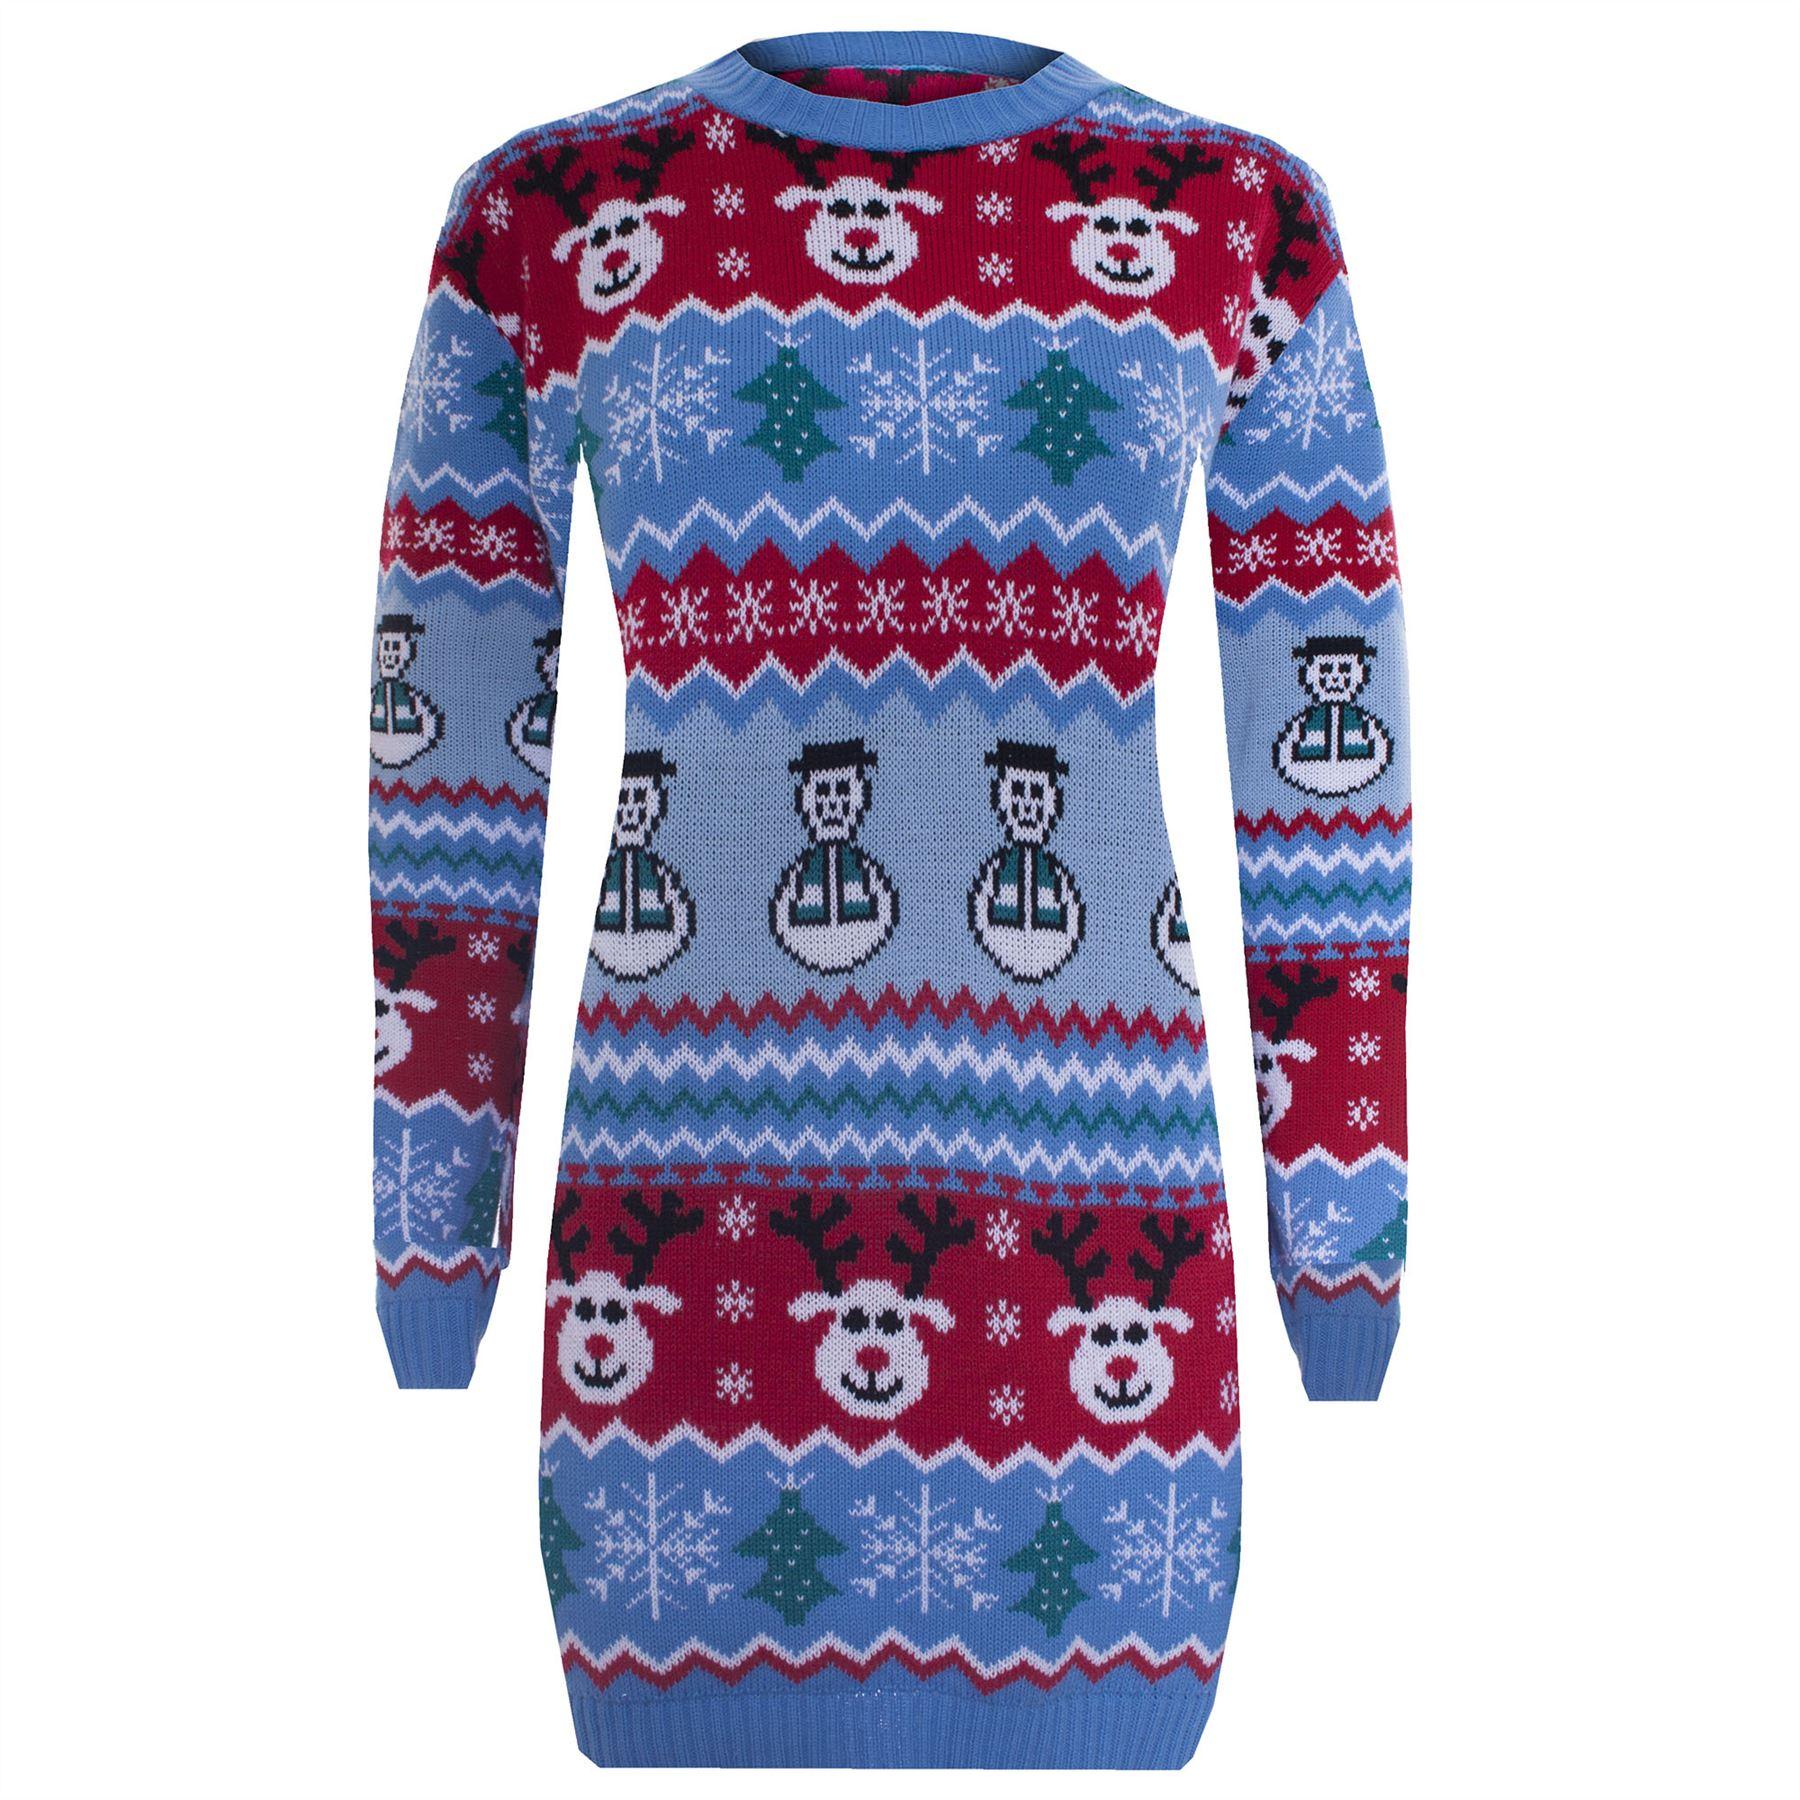 Unisex ladies novelty xmas christmas santa oversize jumper dress top